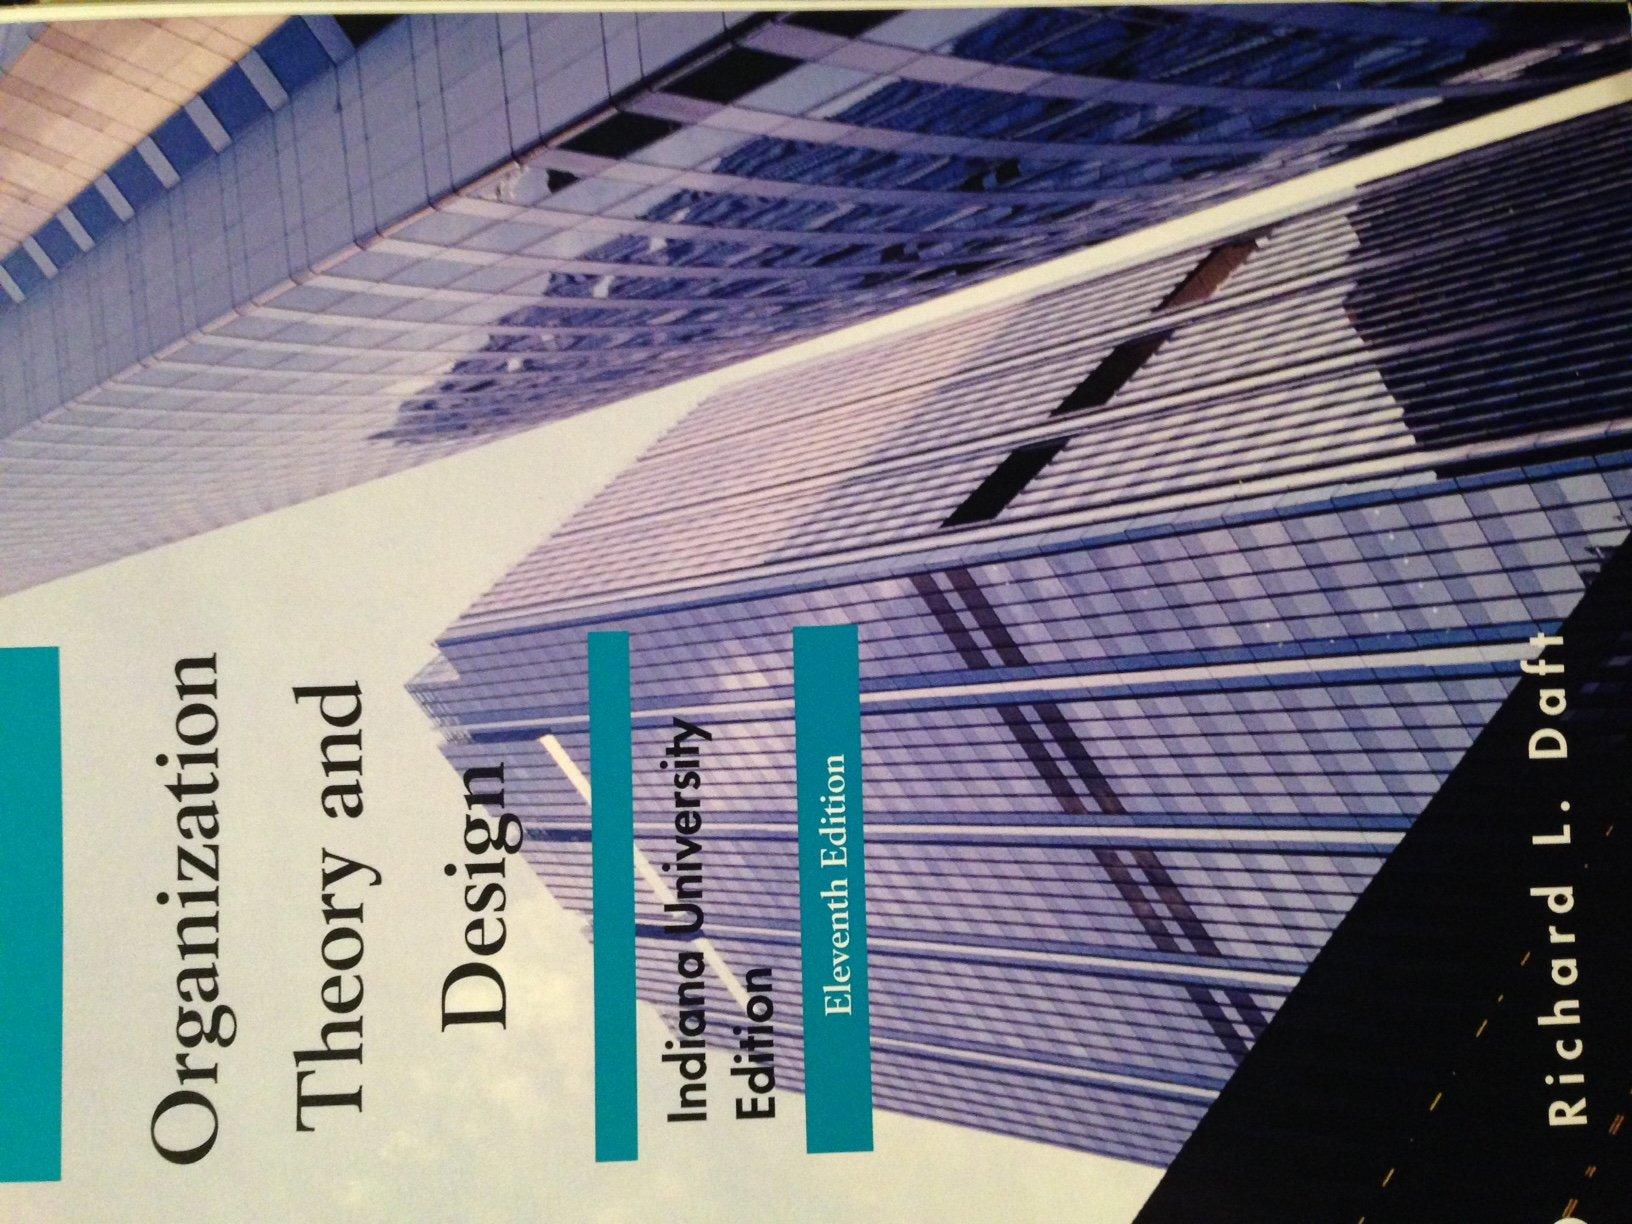 Organization Theory Design 11th Edition Richard Daft Isbn 9781285879123 Richard Daft 9781285879123 Amazon Com Books